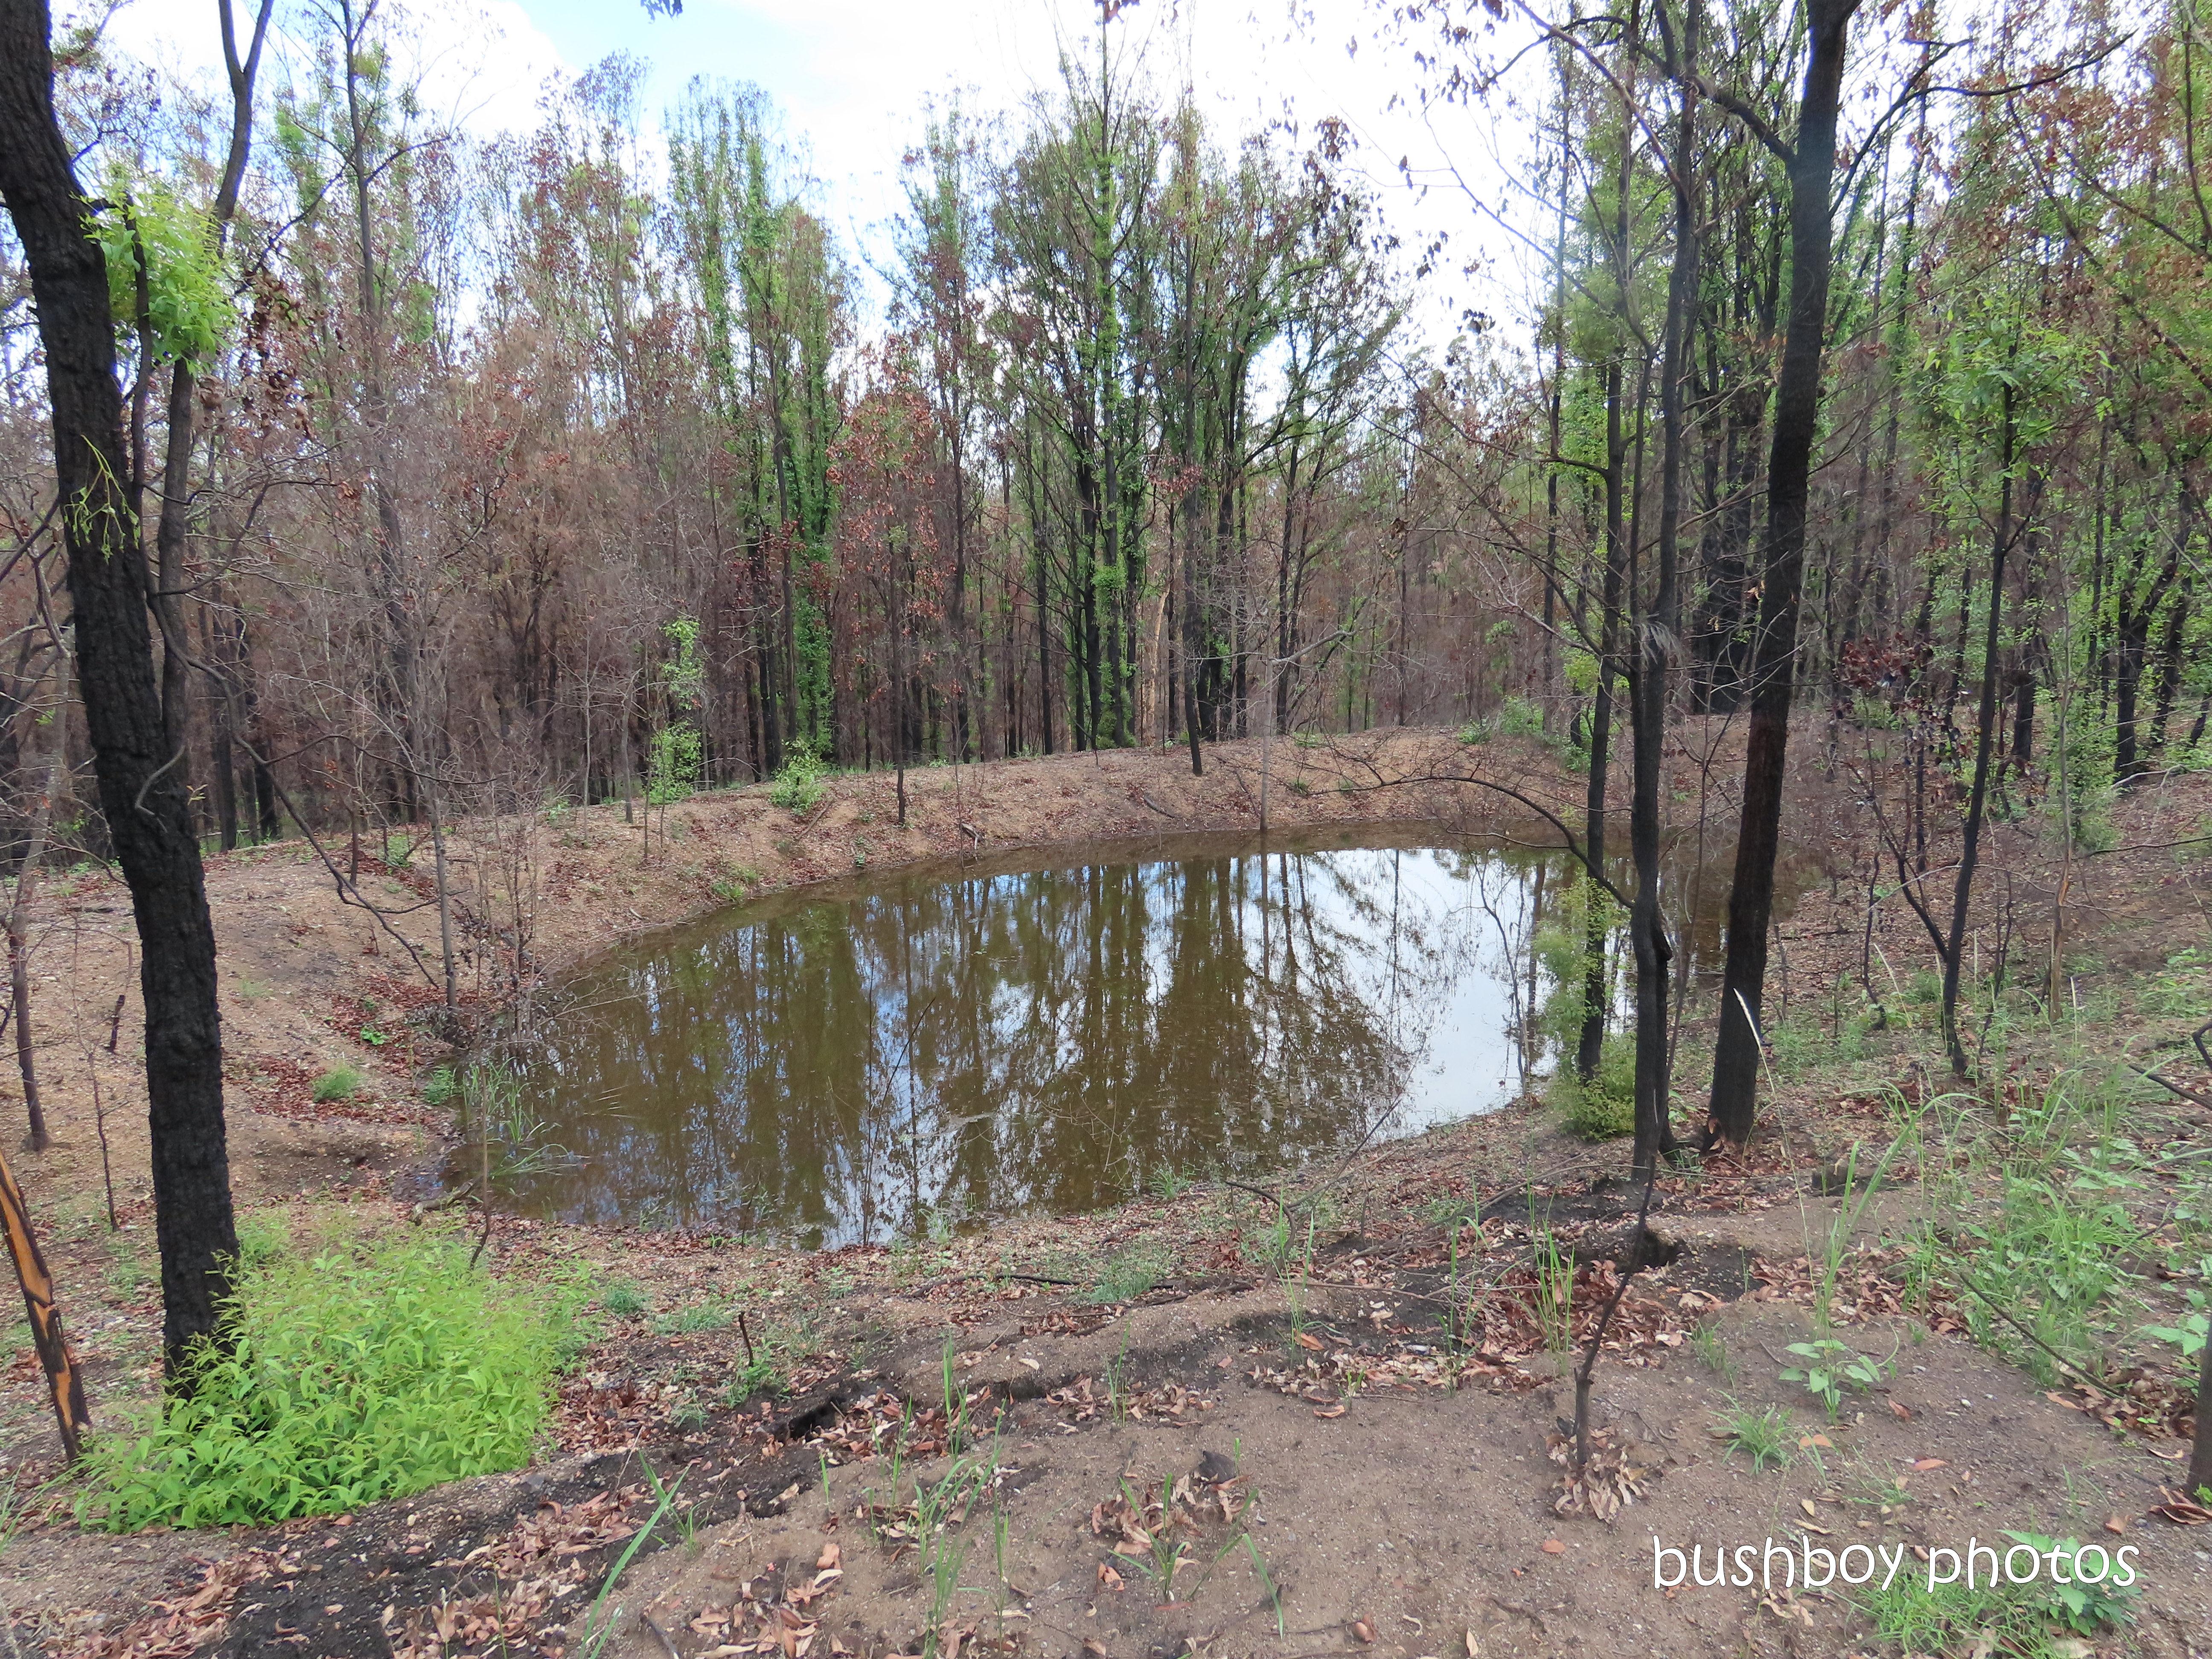 20200211_blog challenge_water water_small dam_wetland_home